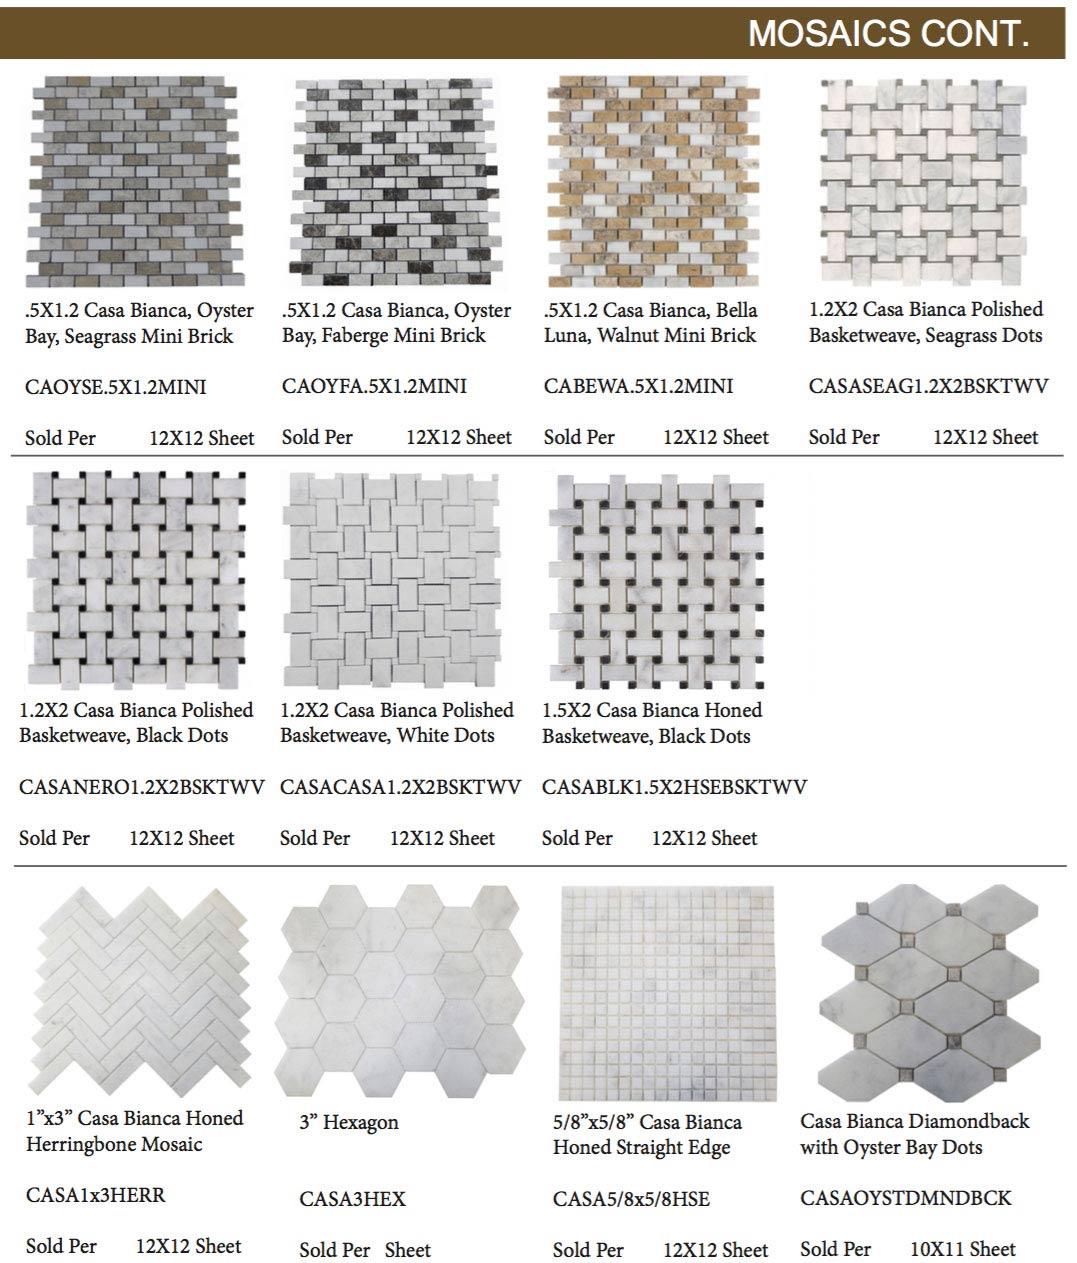 Casa-Bianca-Marble-Mosaics-Continued